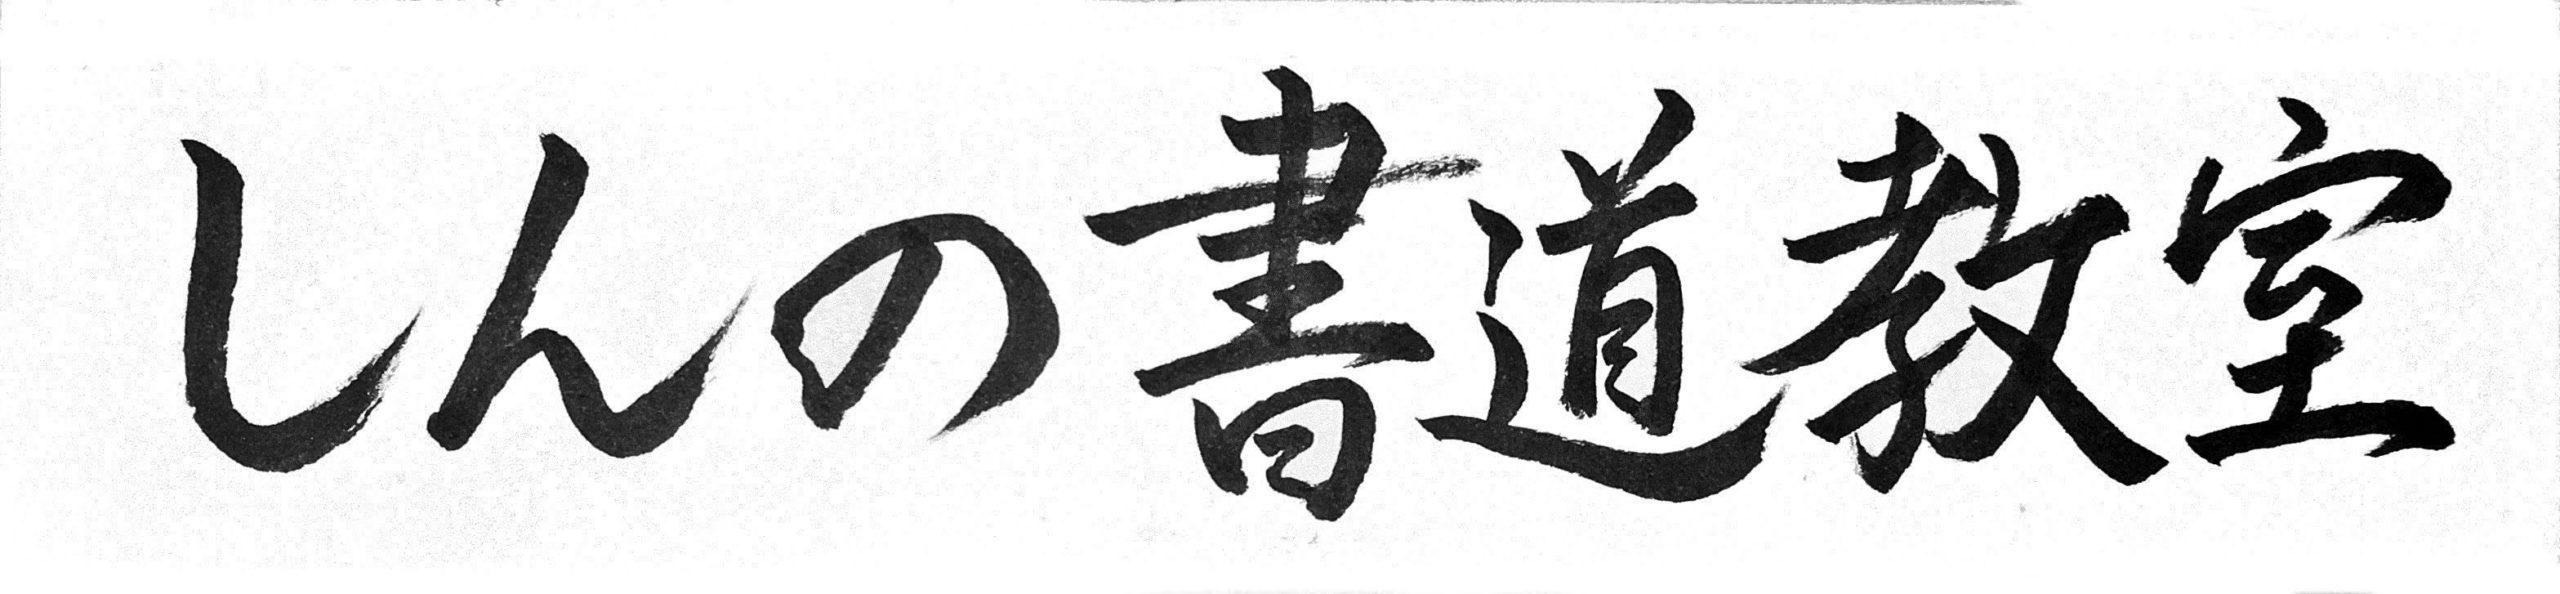 守山市 | 日本習字*しんの書道教室 | 幼児・小学生・中学生~大人の習字教室